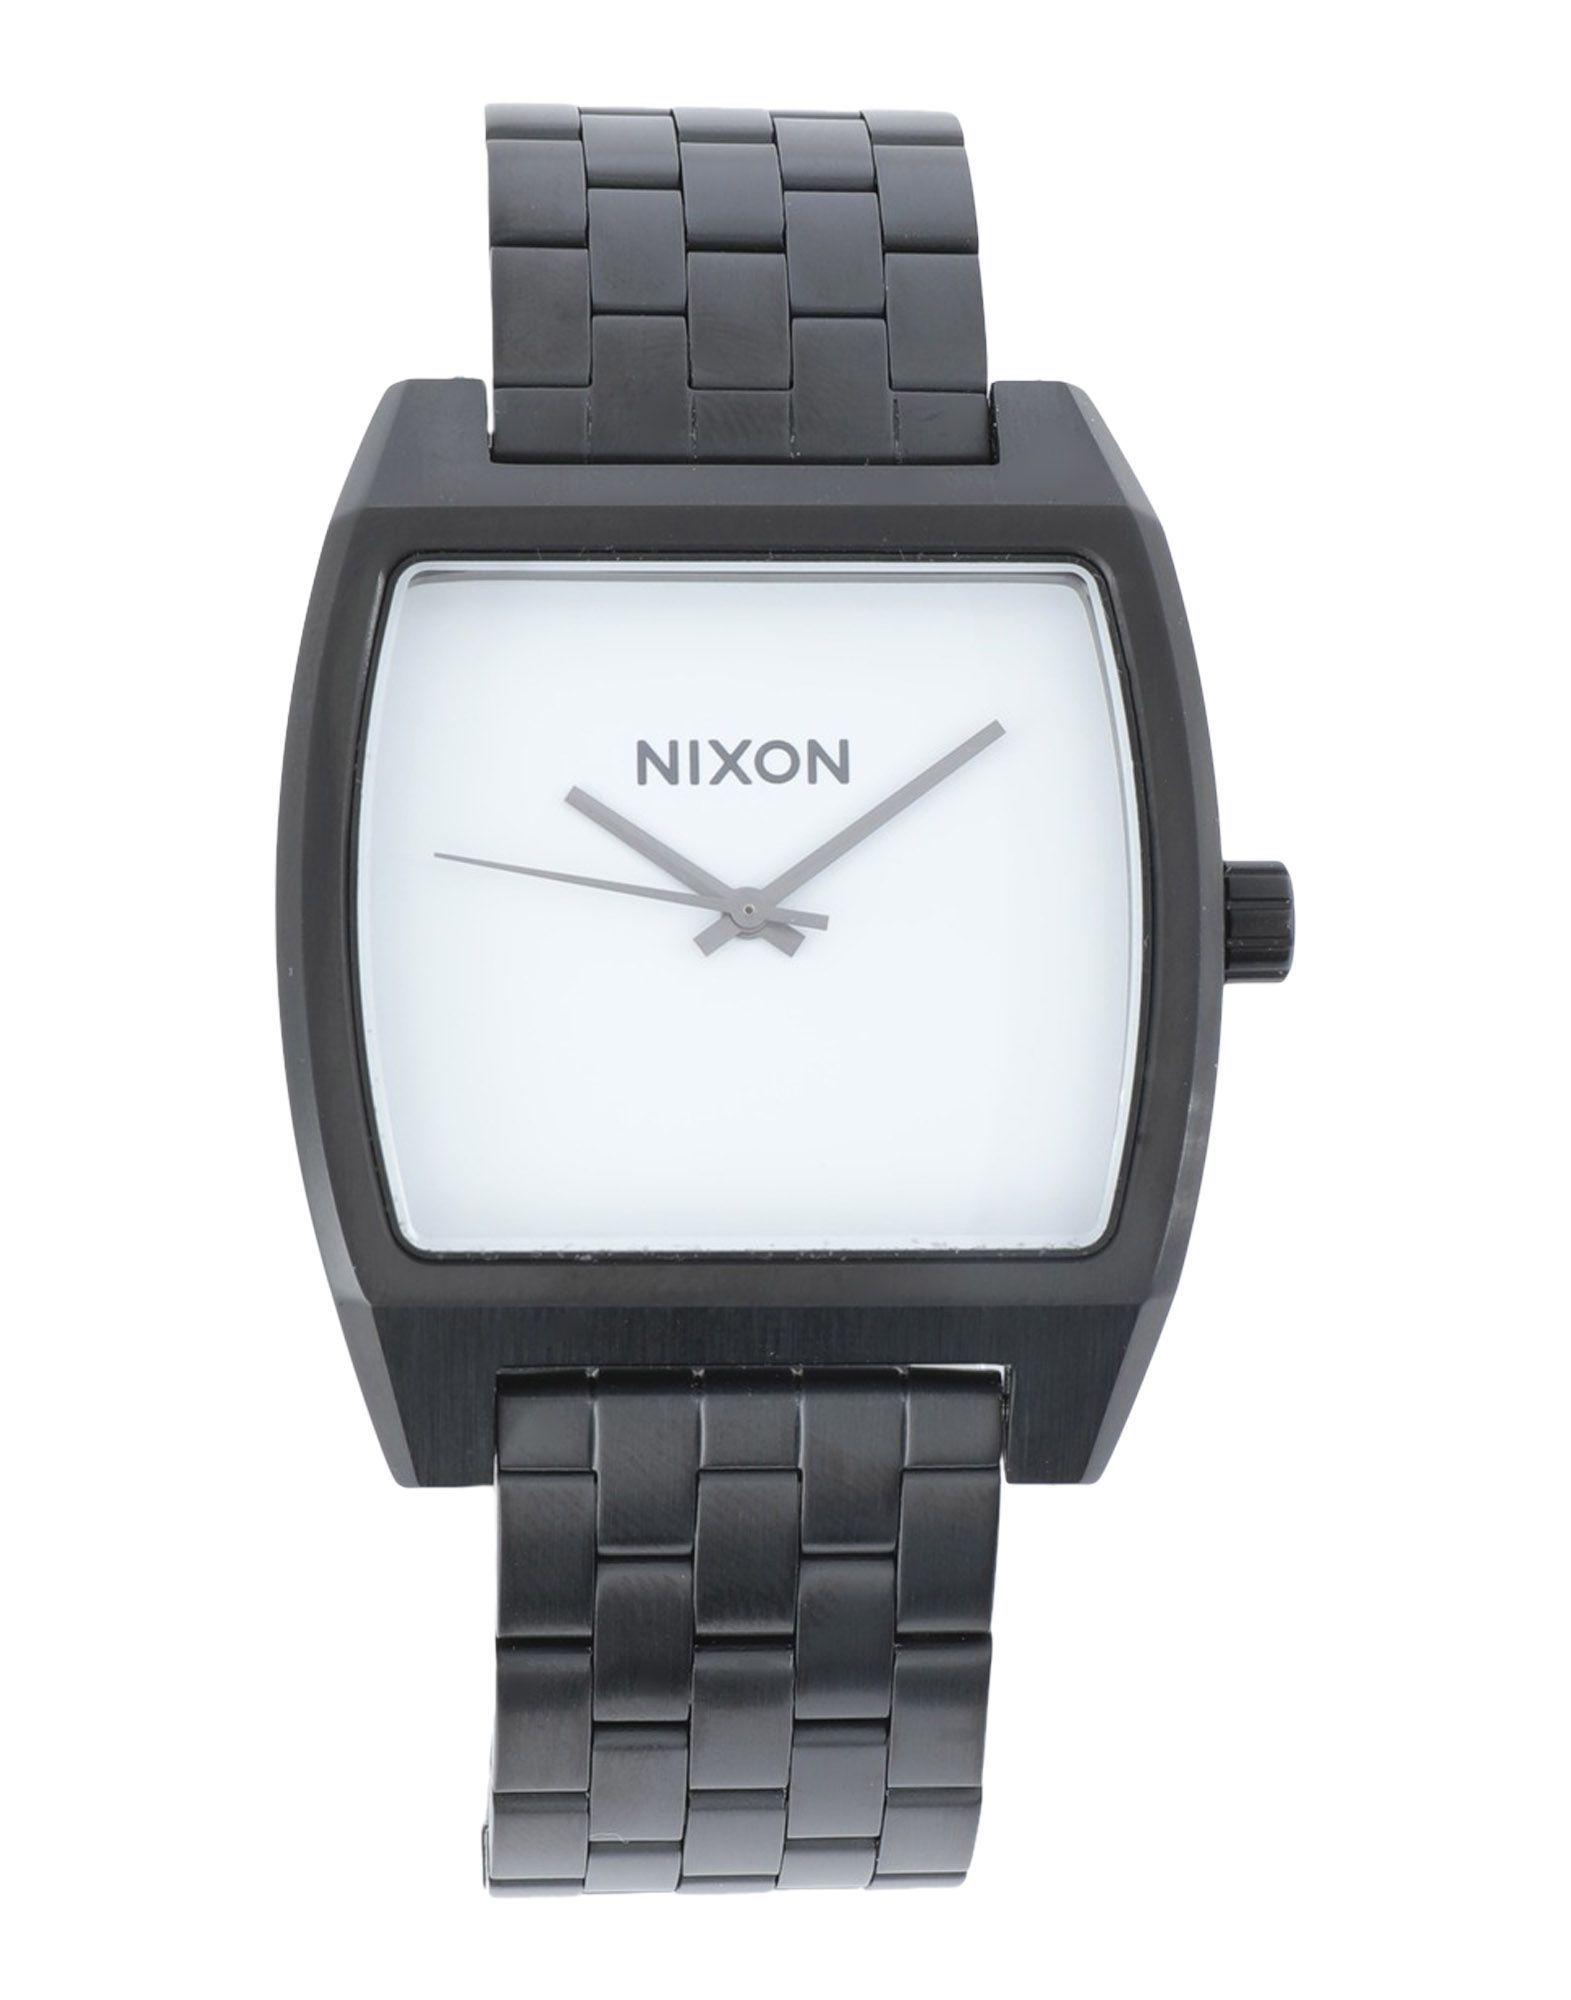 TIMEPIECES Unisex Nixon White Stainless Steel